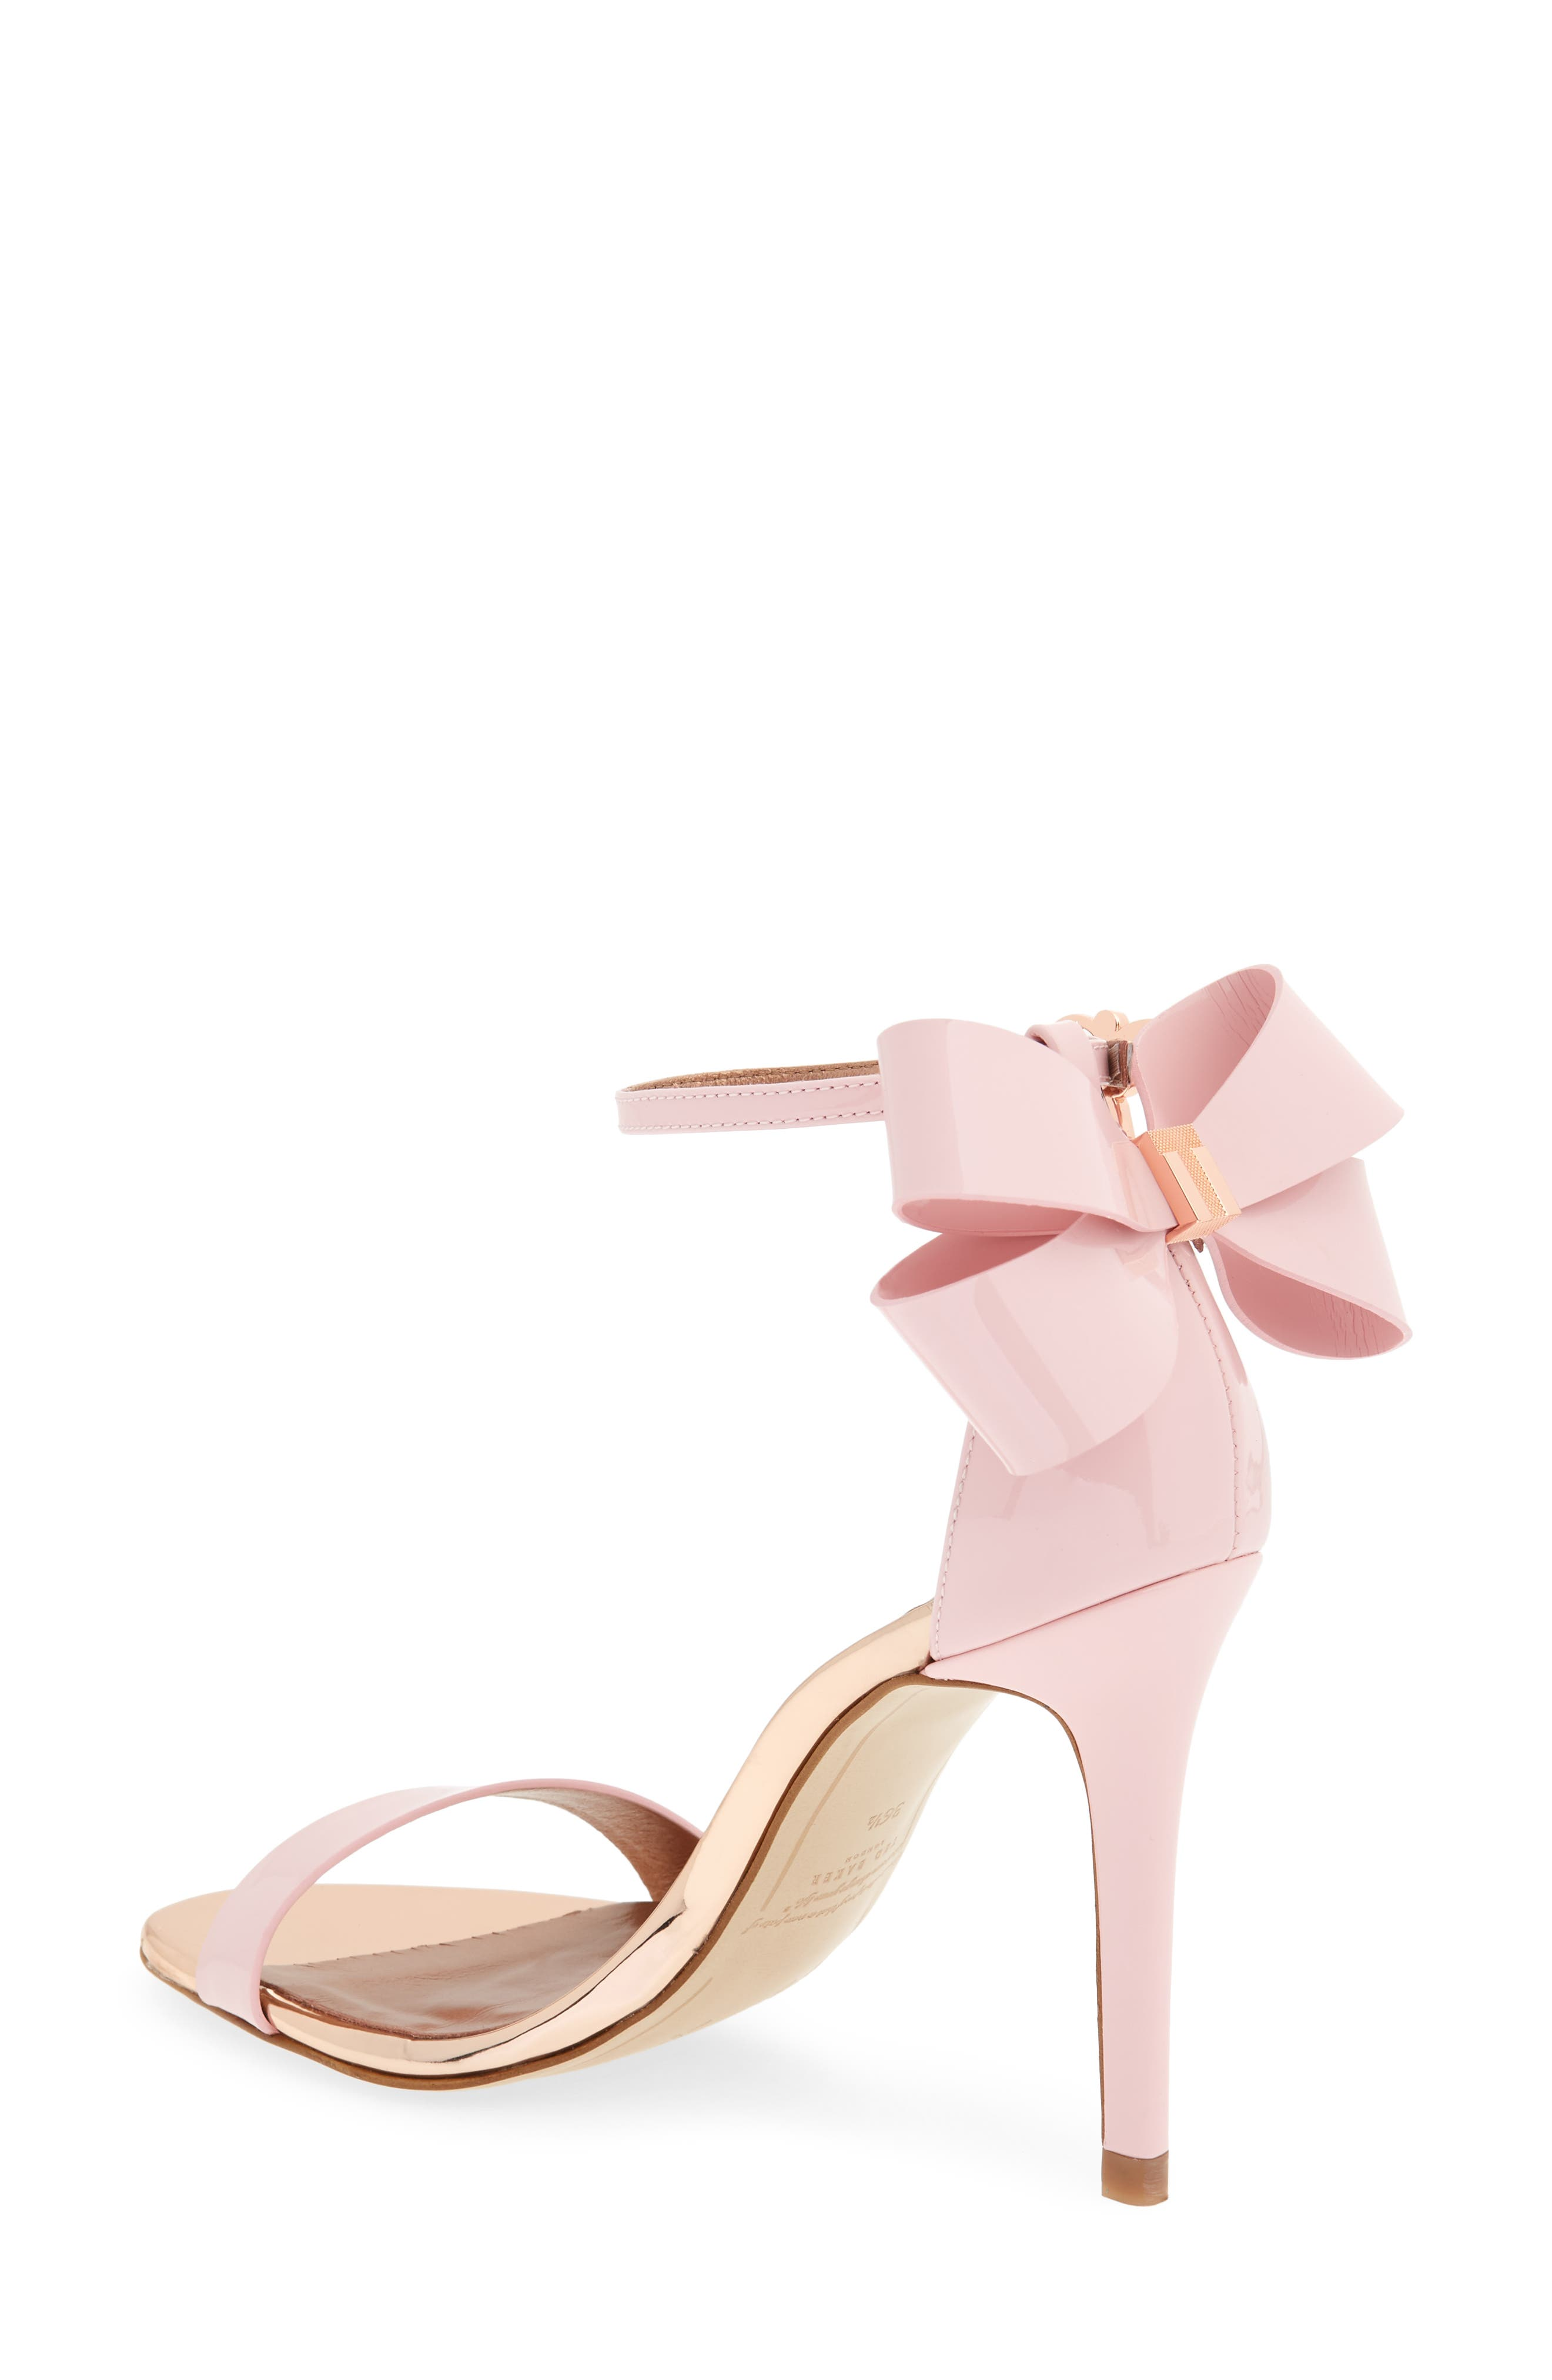 Sandalo Sandal,                             Alternate thumbnail 2, color,                             Light Pink Leather